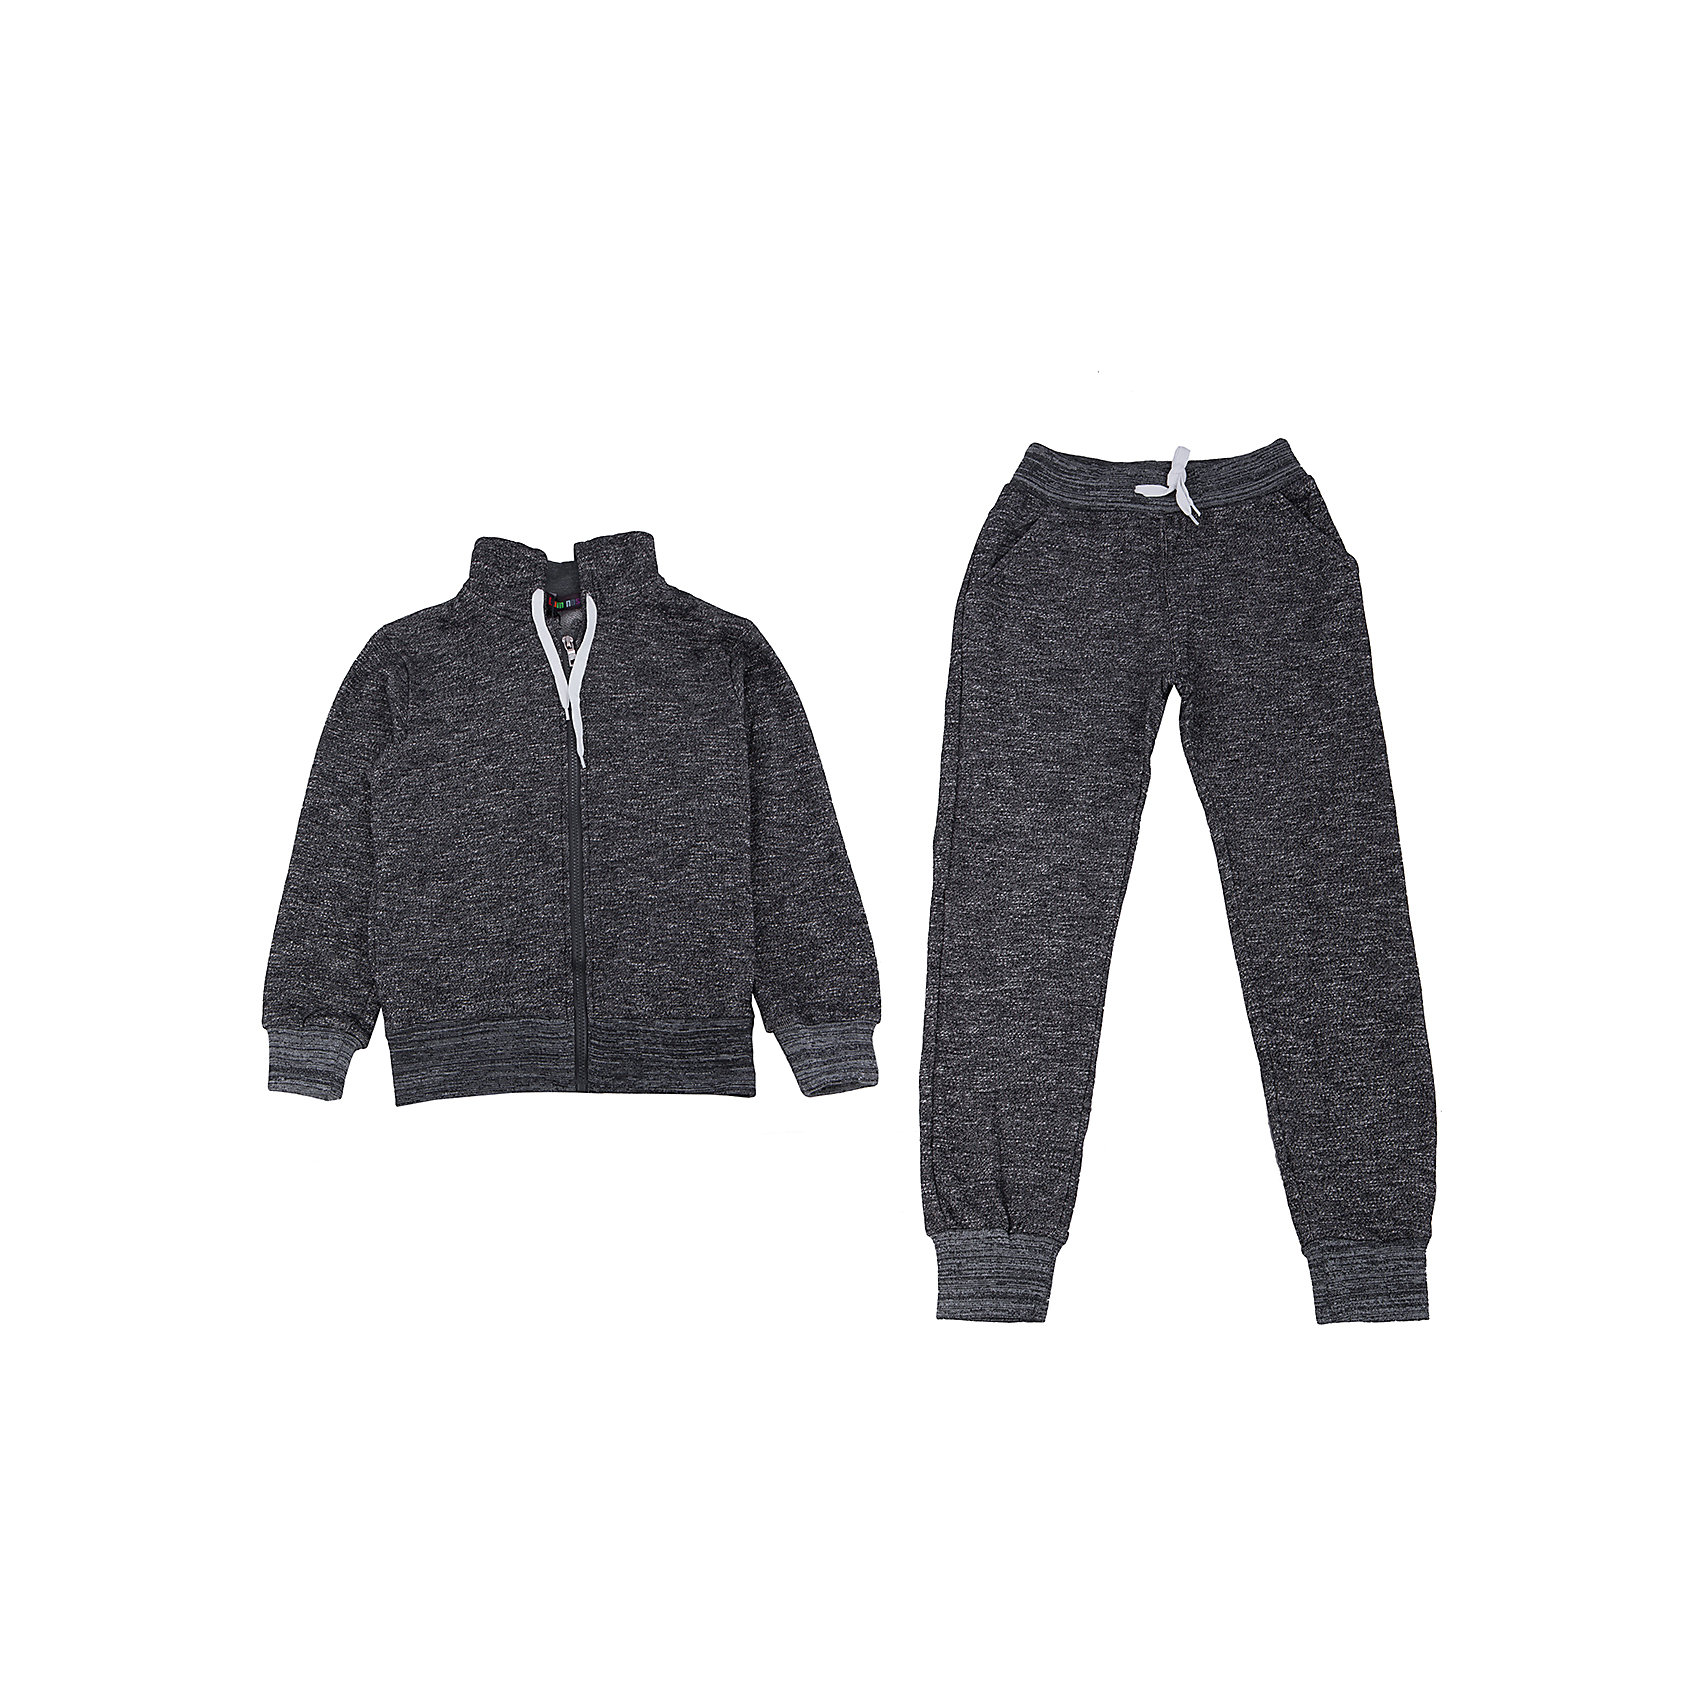 цена Luminoso Спортивный костюм для мальчика Luminoso онлайн в 2017 году